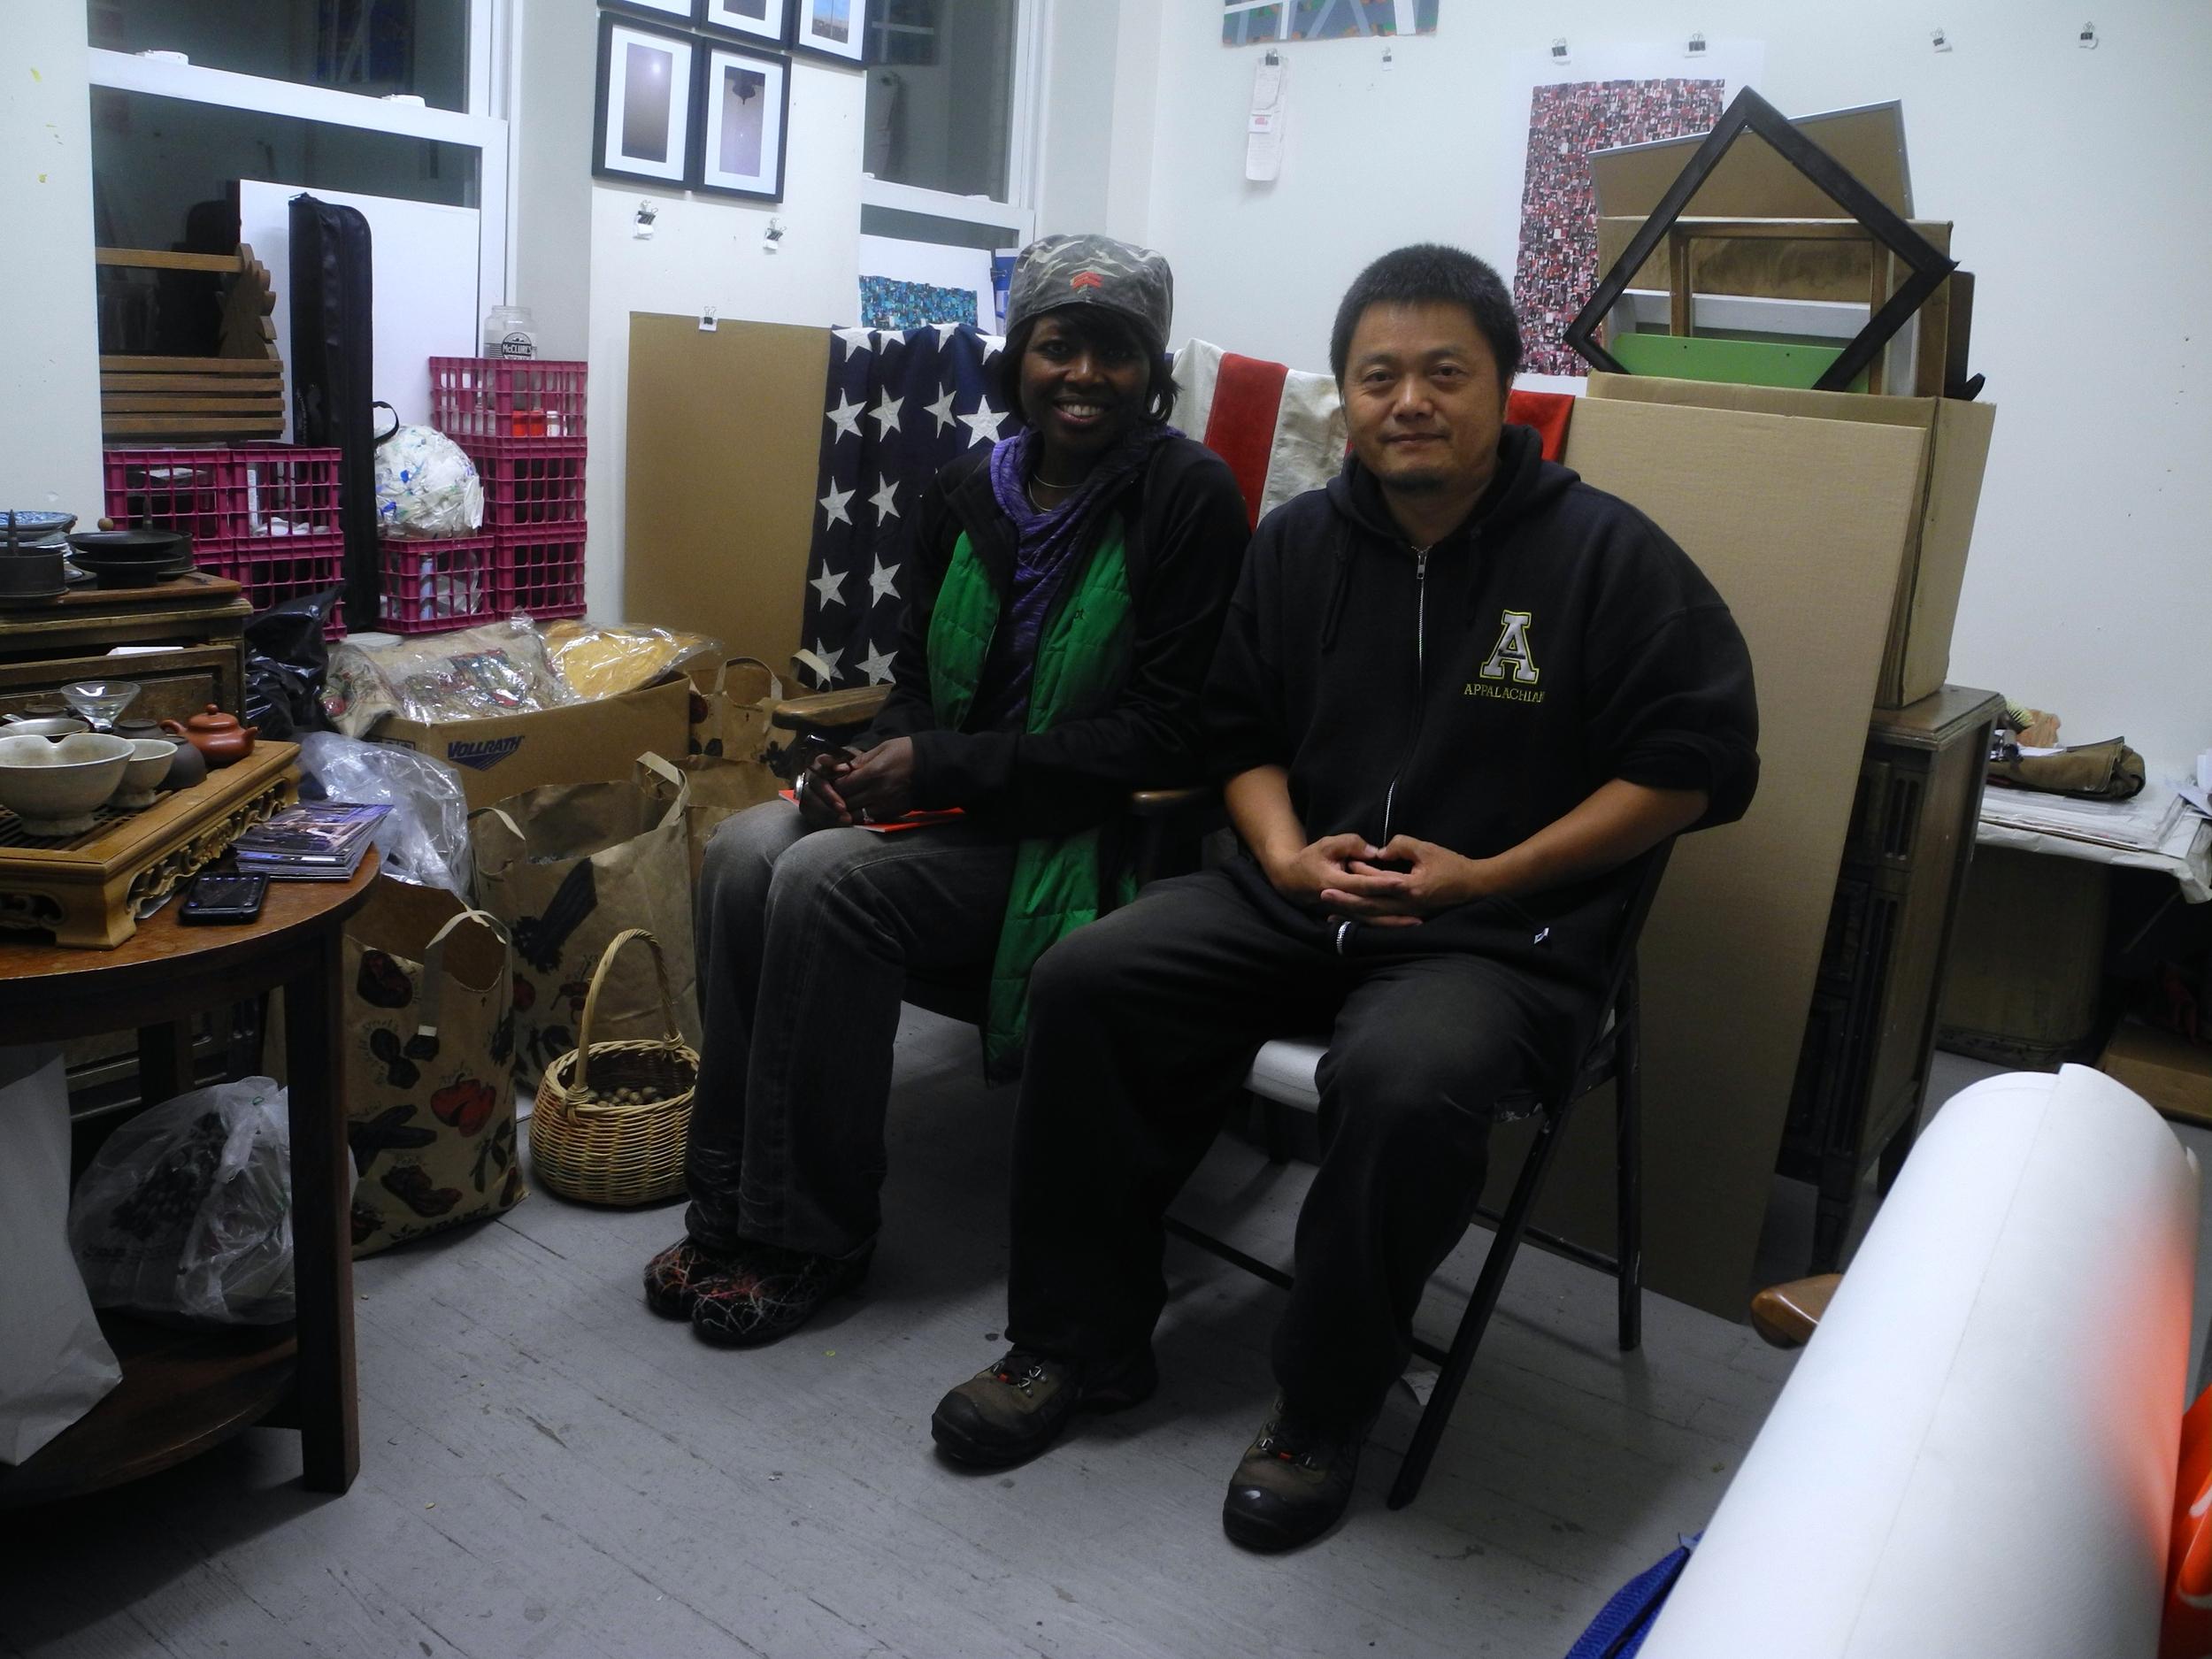 Visiting with artist, Xuewu Zheng at his Art Centro studio. 10/23/14.